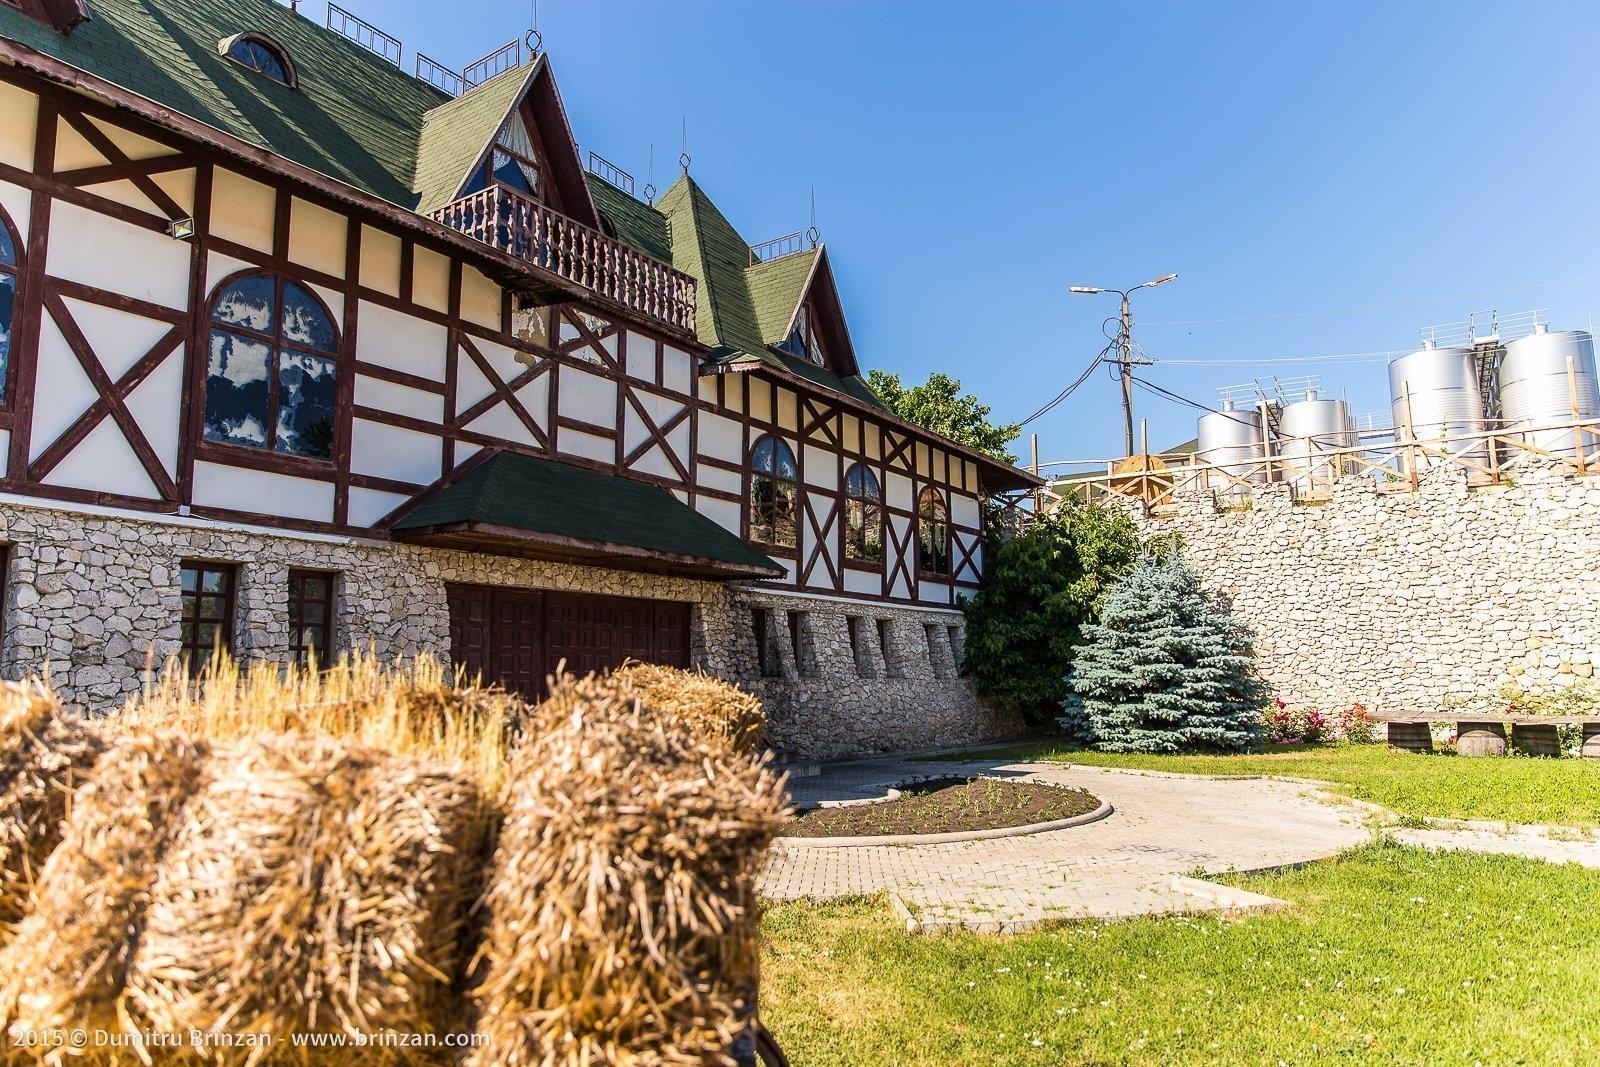 Asconi Winery in Puhoi Village, Moldova - Outside